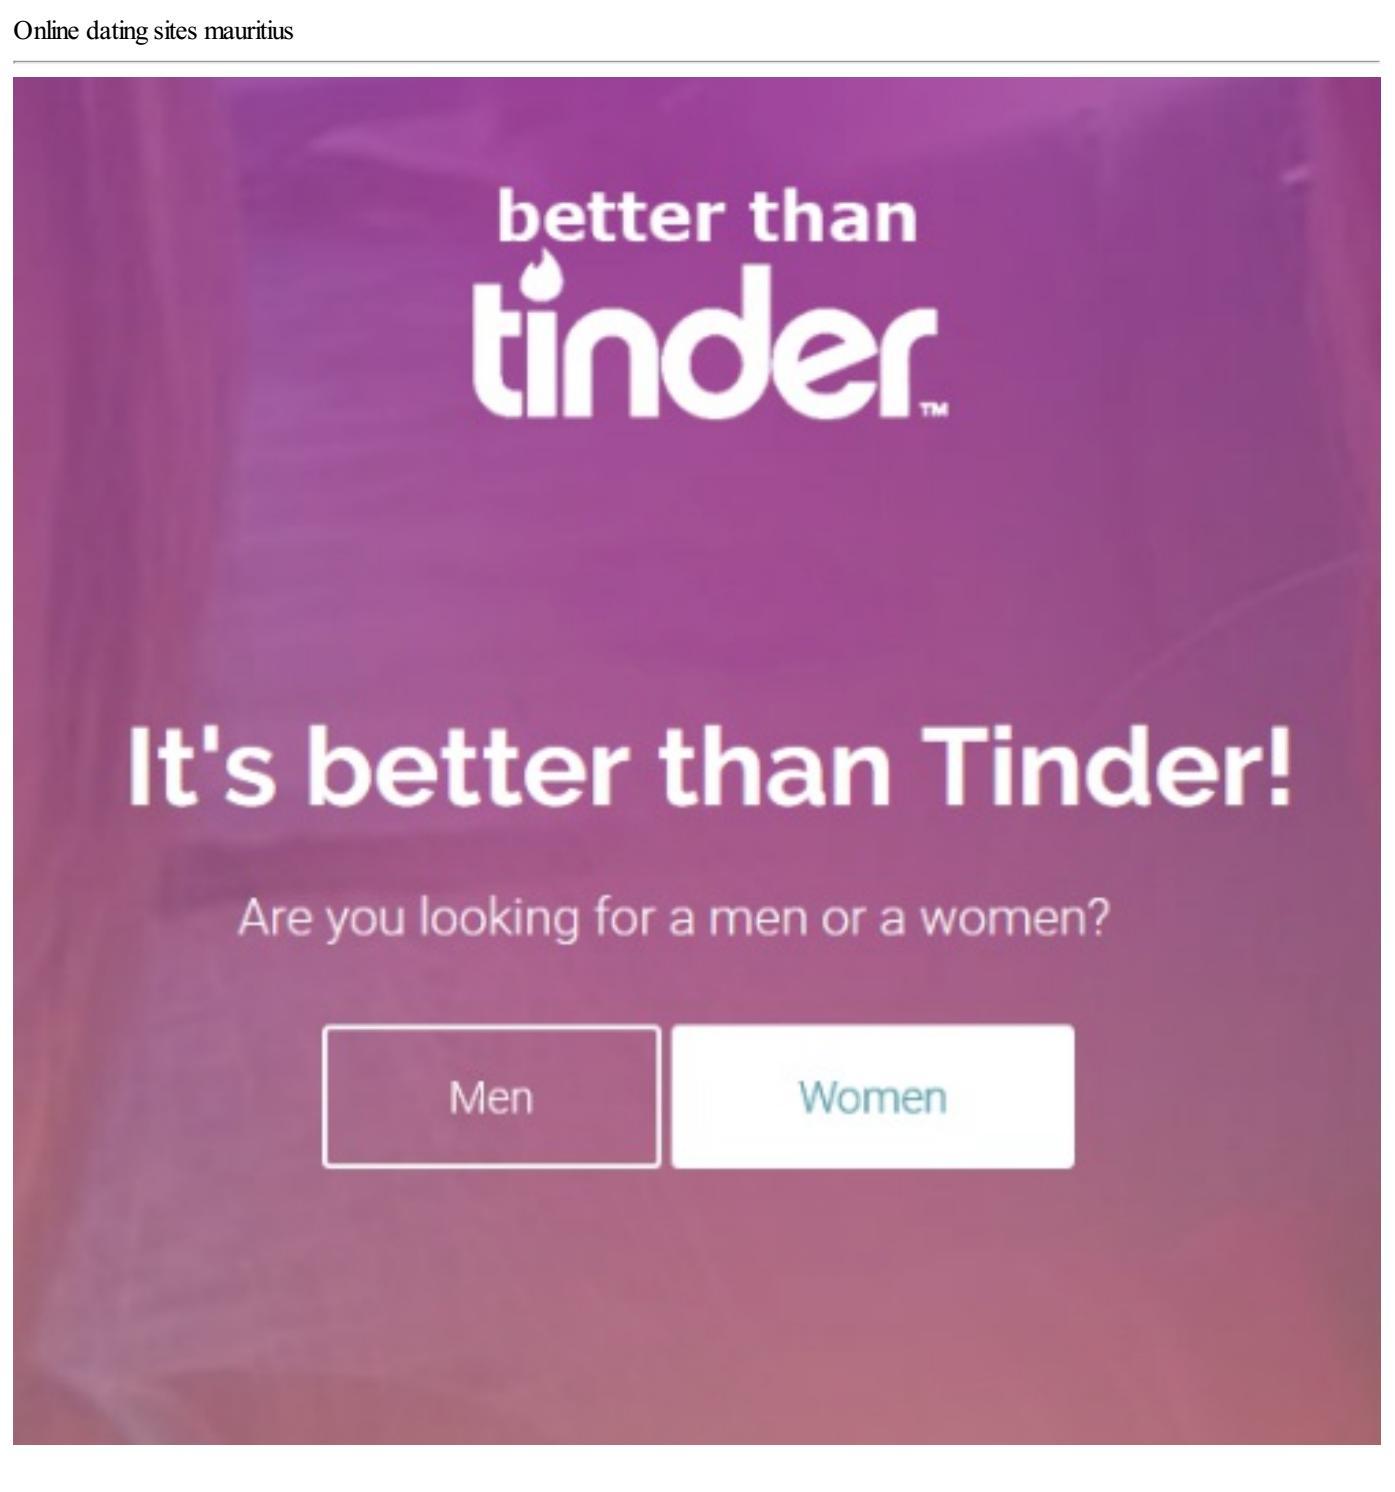 online dating mauritius